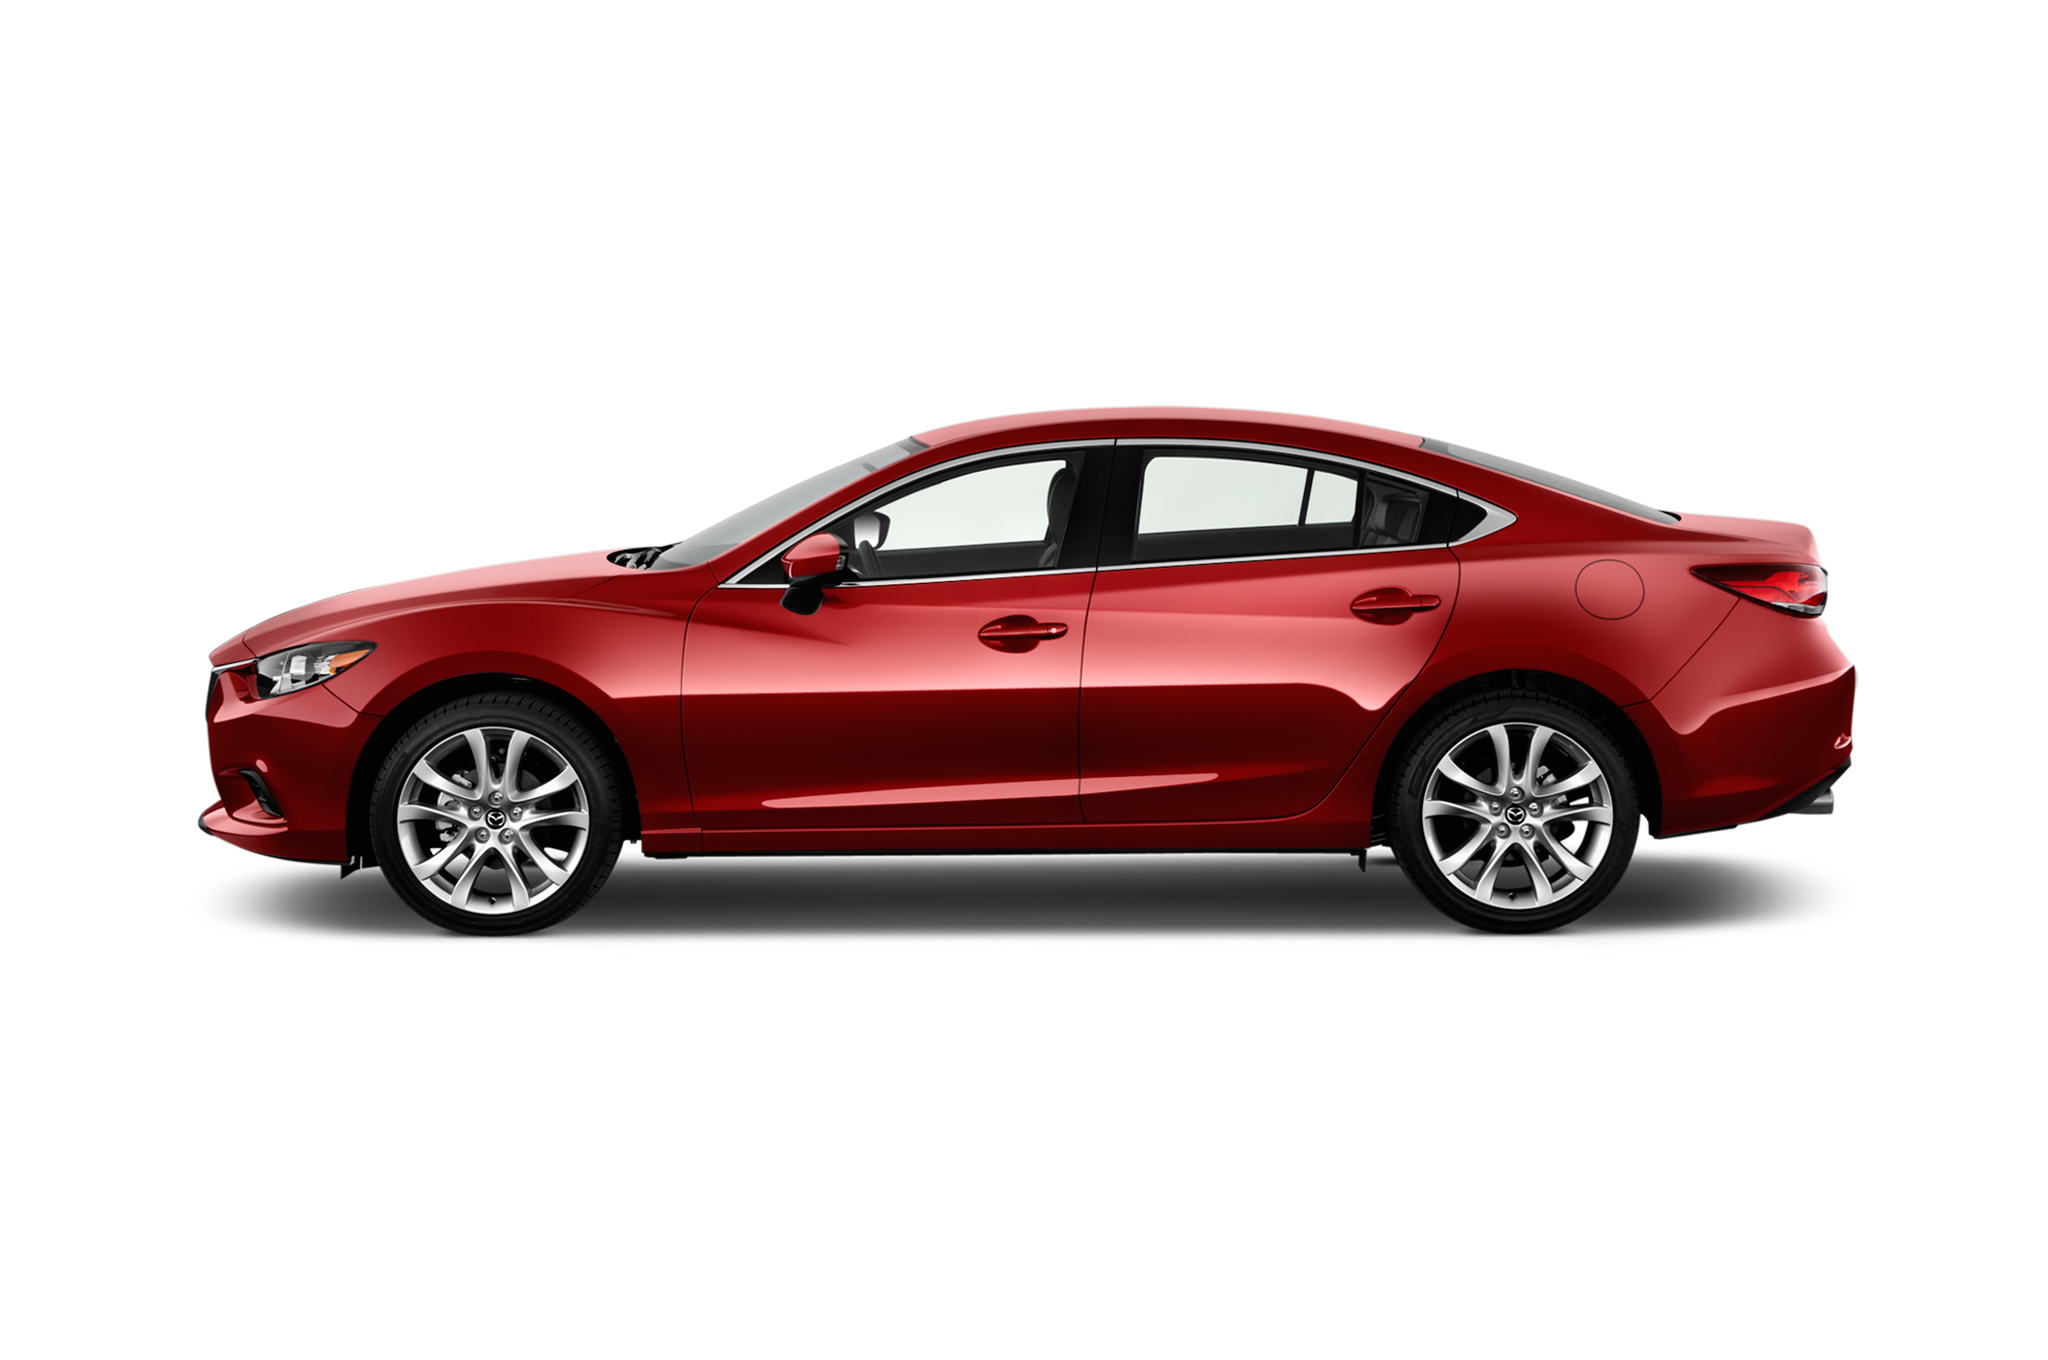 manual wrap test and term reviews up s driver photo hatchback mazda car original msrp long